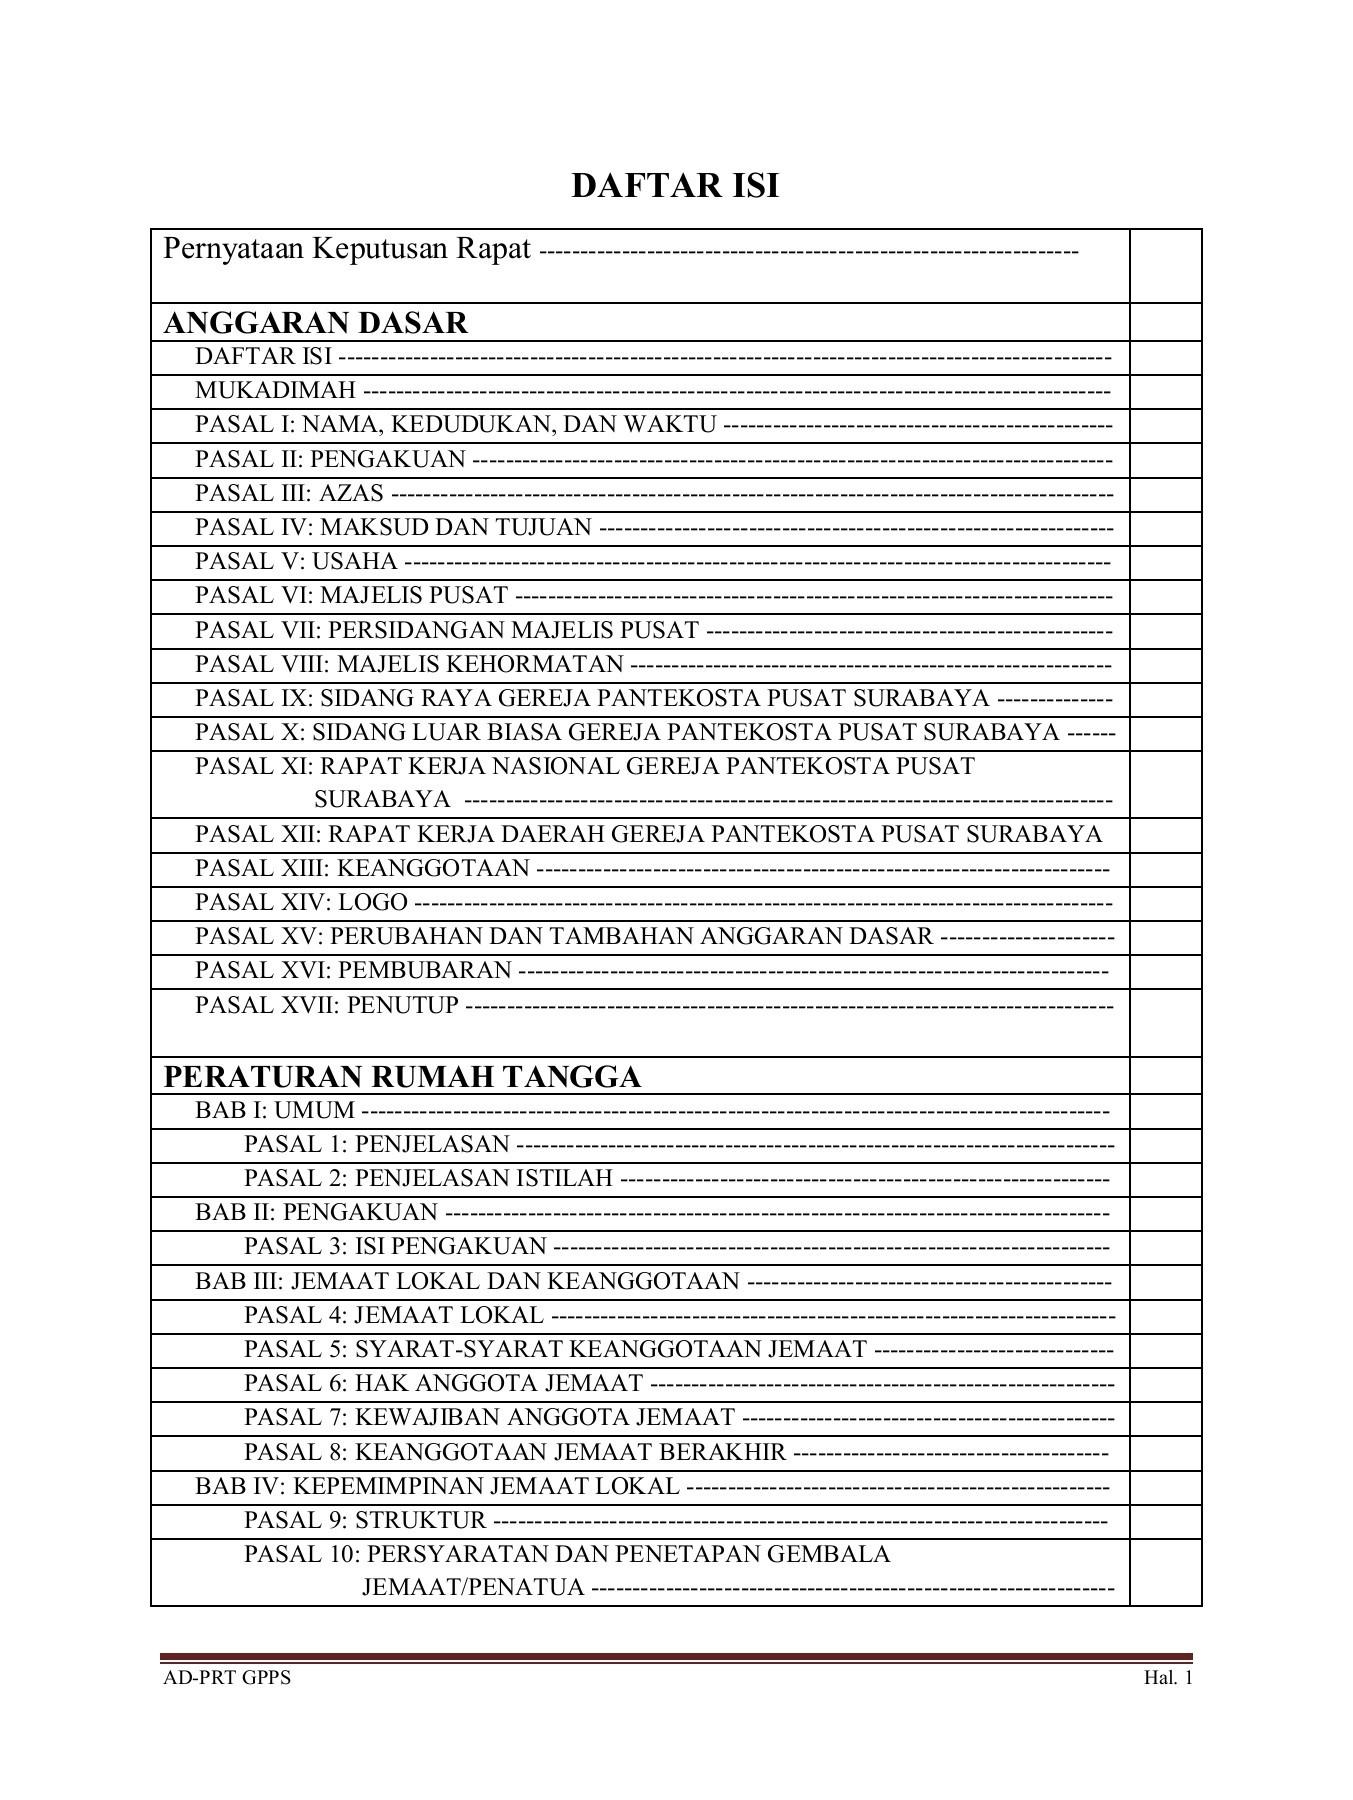 Ad Prt Gpps 2012 Flip Book Pages 1 42 Pubhtml5